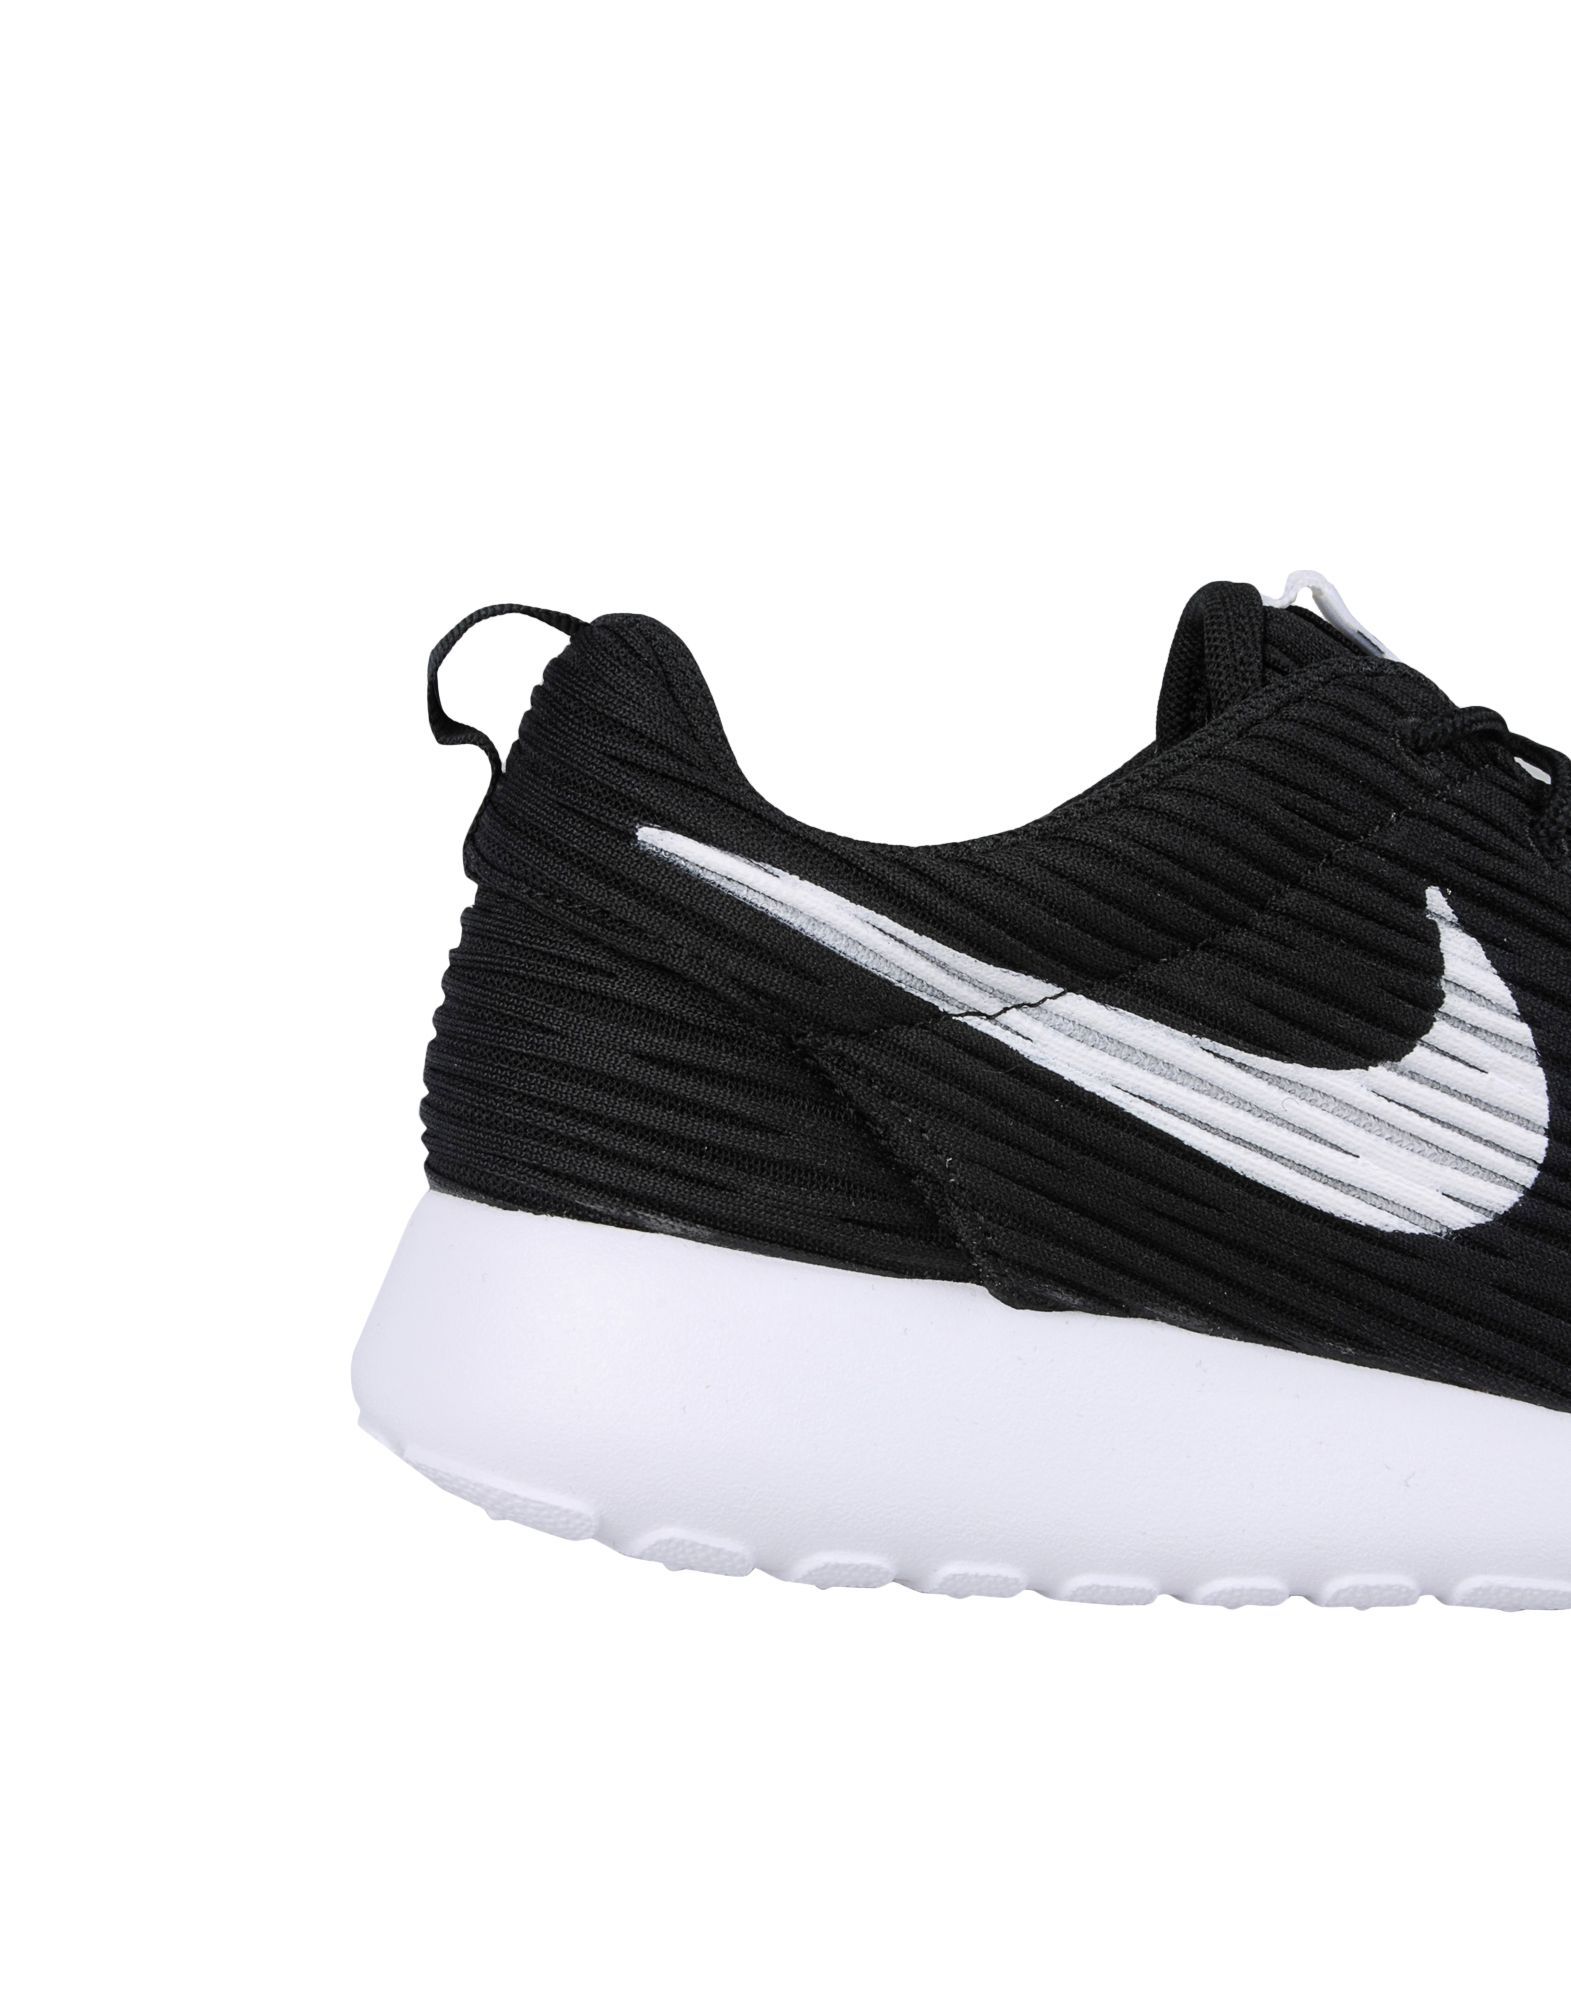 Sneakers Nike Wmns Nike Roshe One Eng - Femme - Sneakers Nike sur